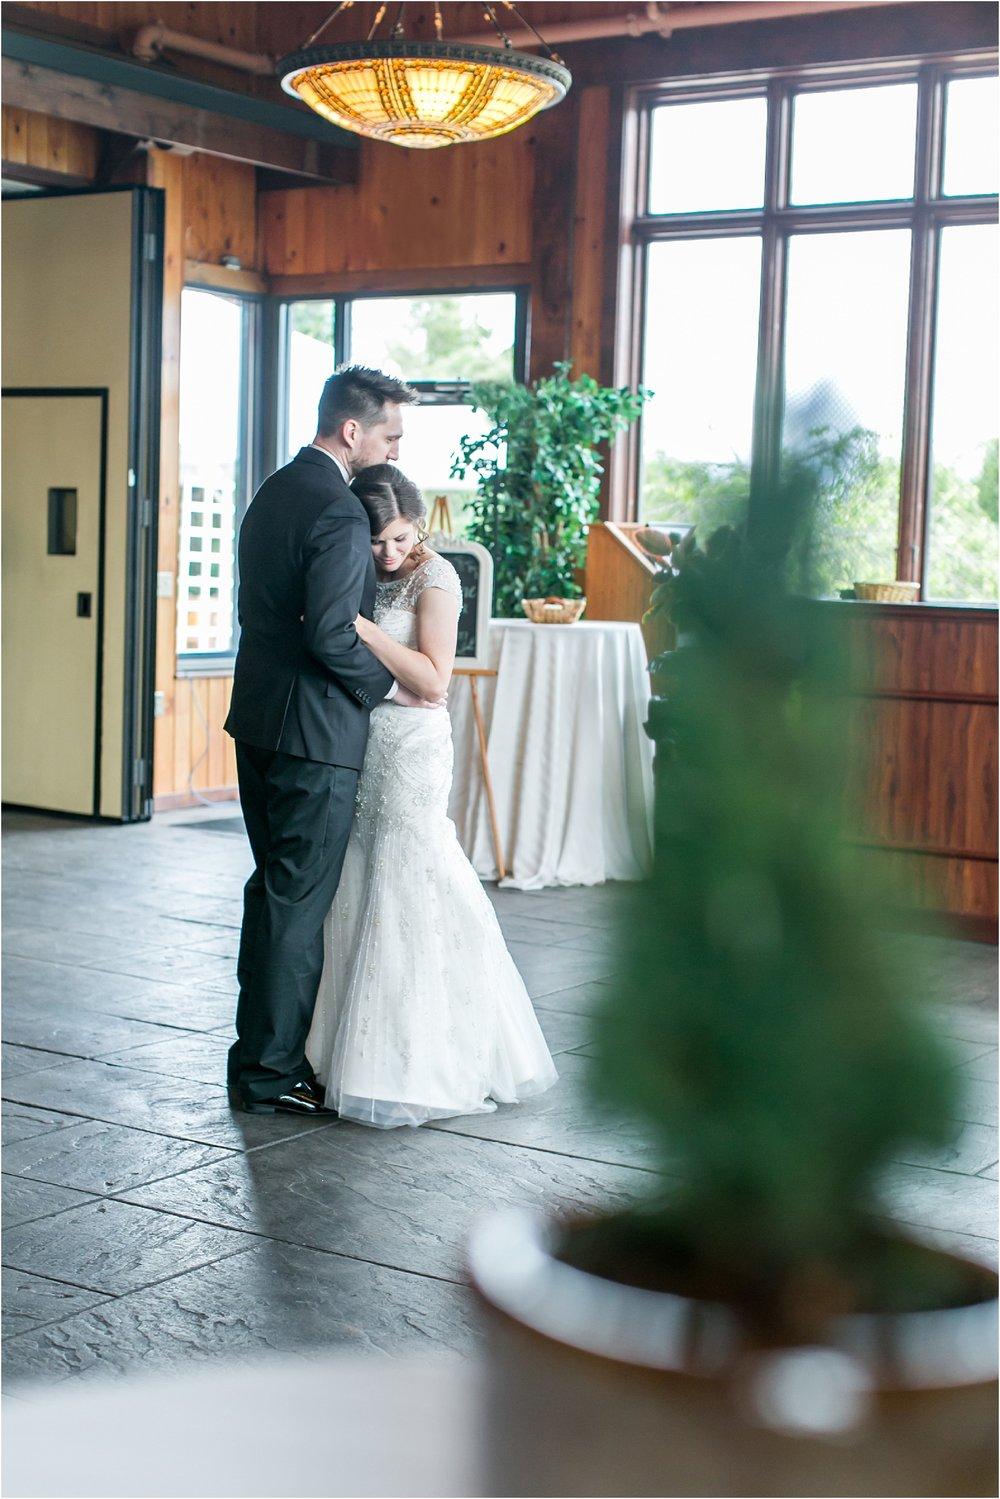 Smith Wedding Liberty Forge Golf Course Wedding Living Radiant Photography Photos_0169.jpg